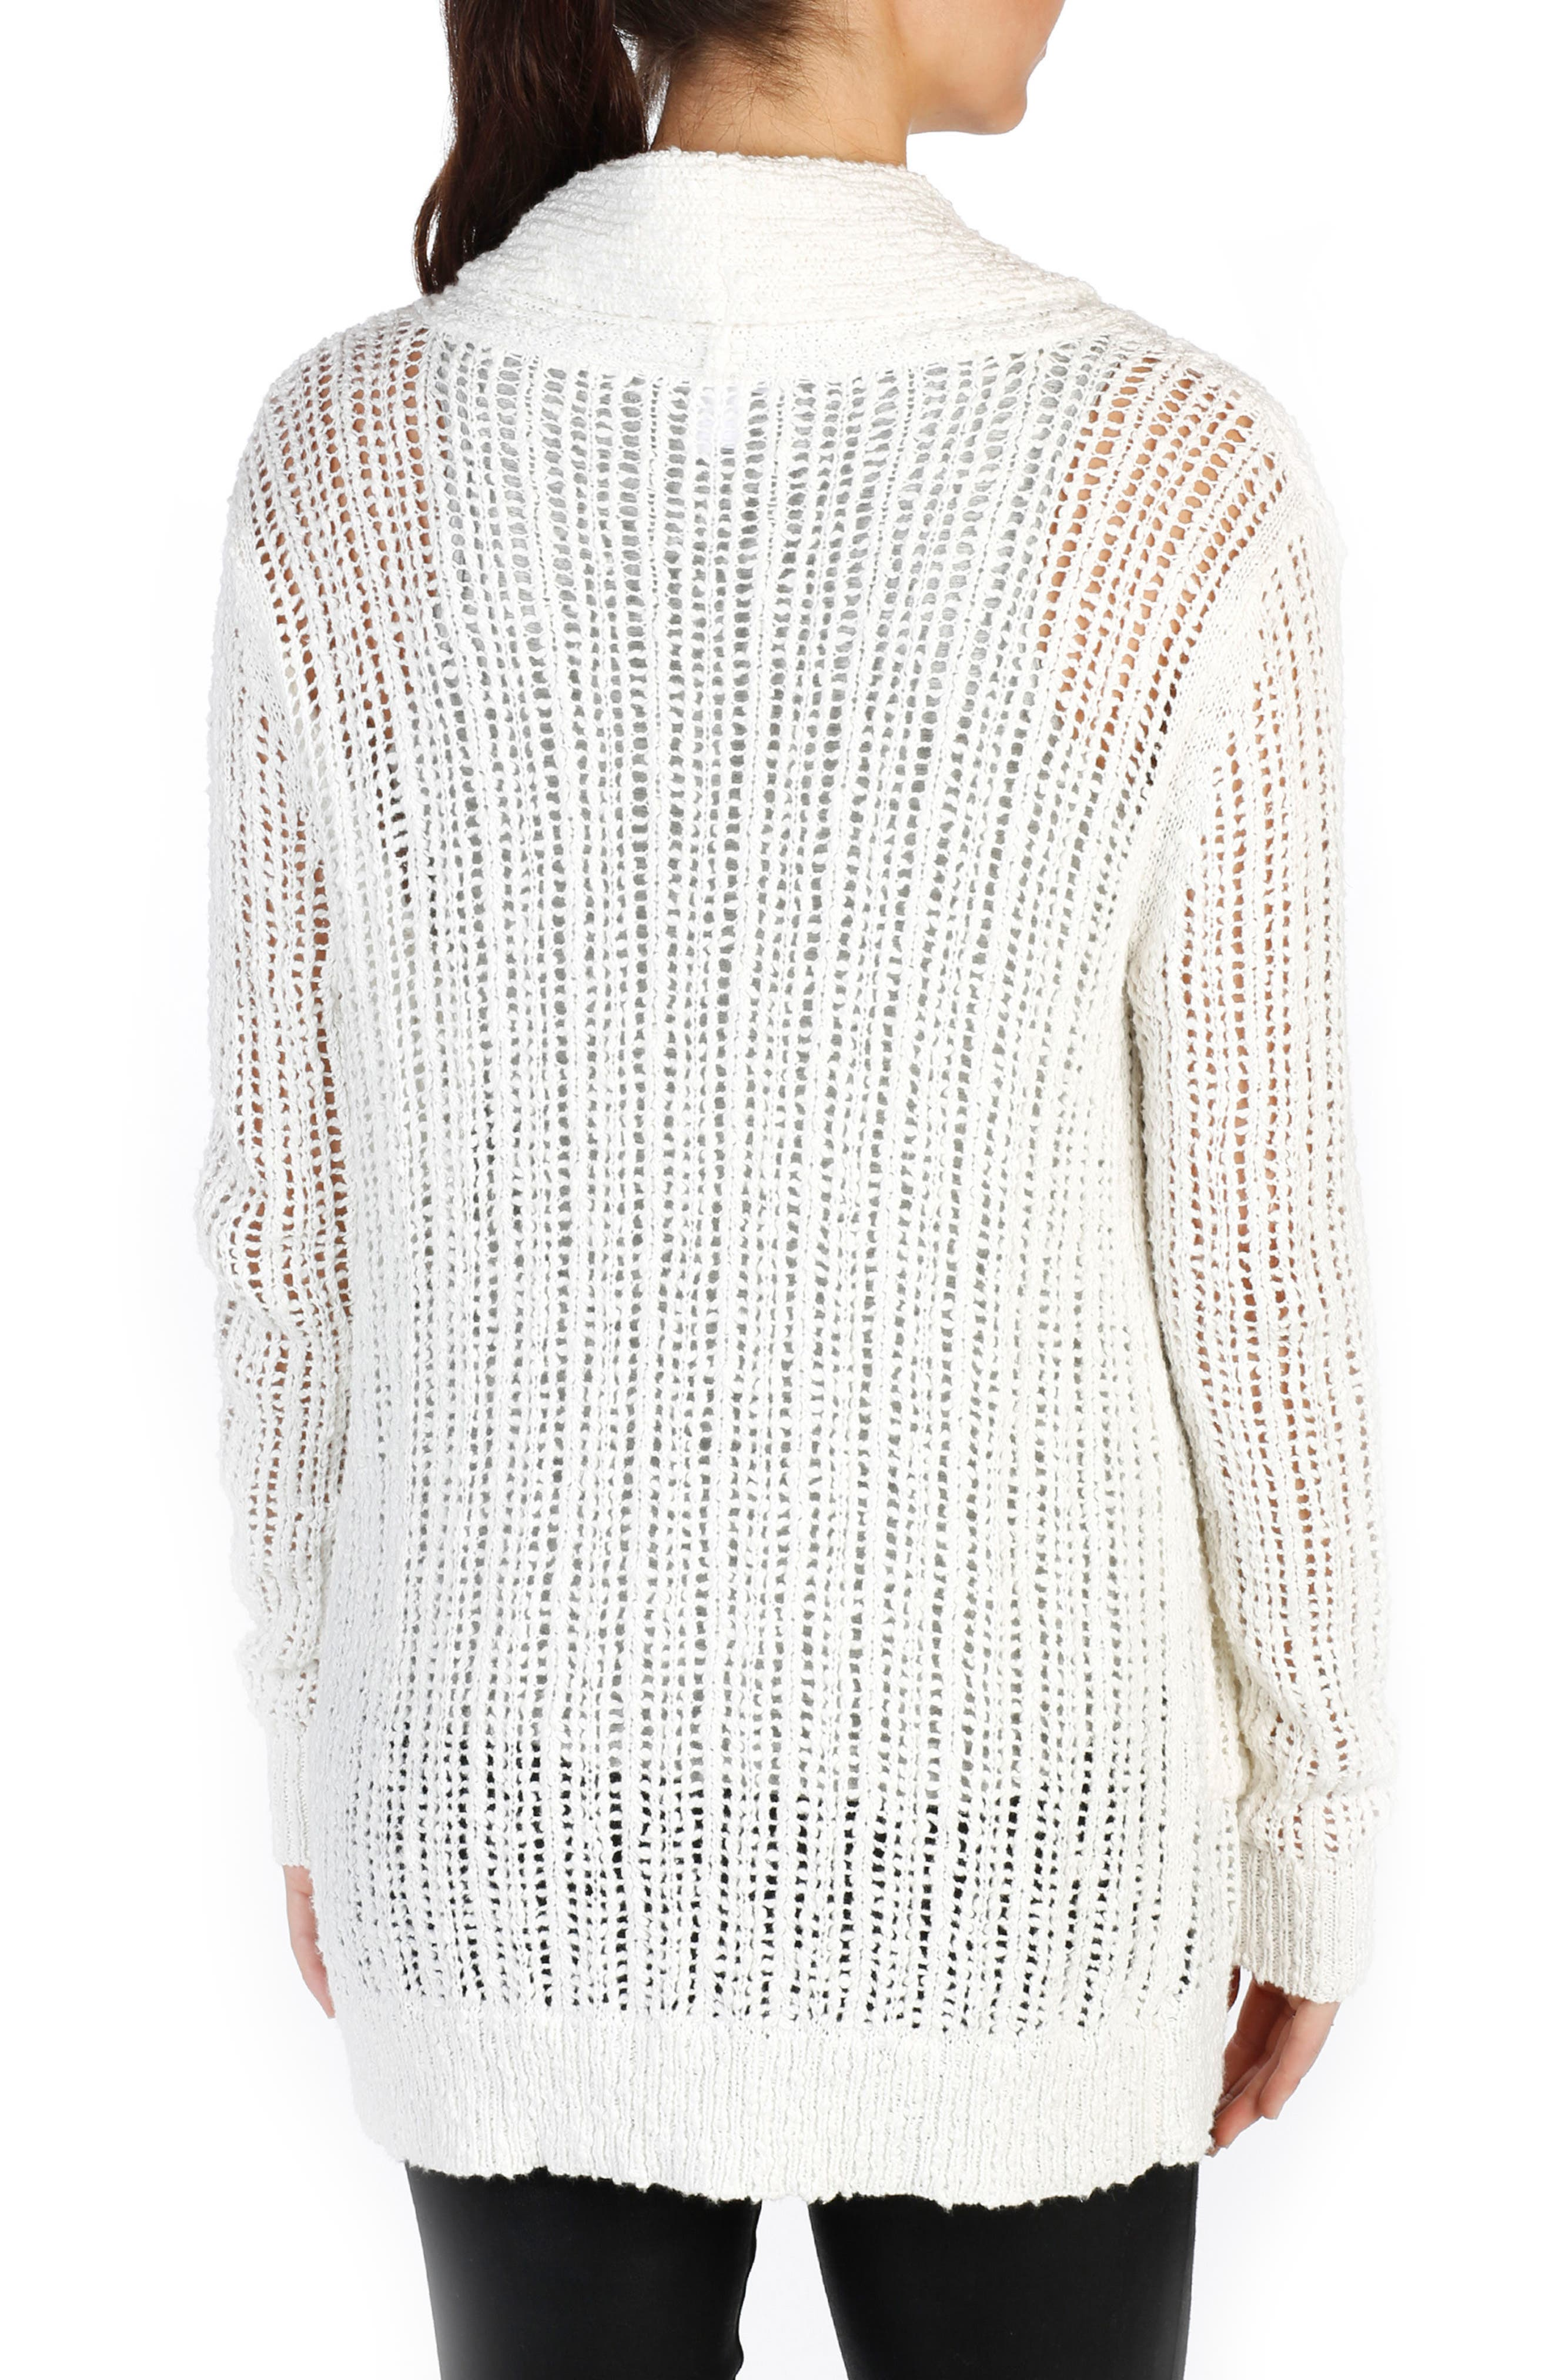 Aimee Cotton Cardigan,                             Alternate thumbnail 2, color,                             Bone